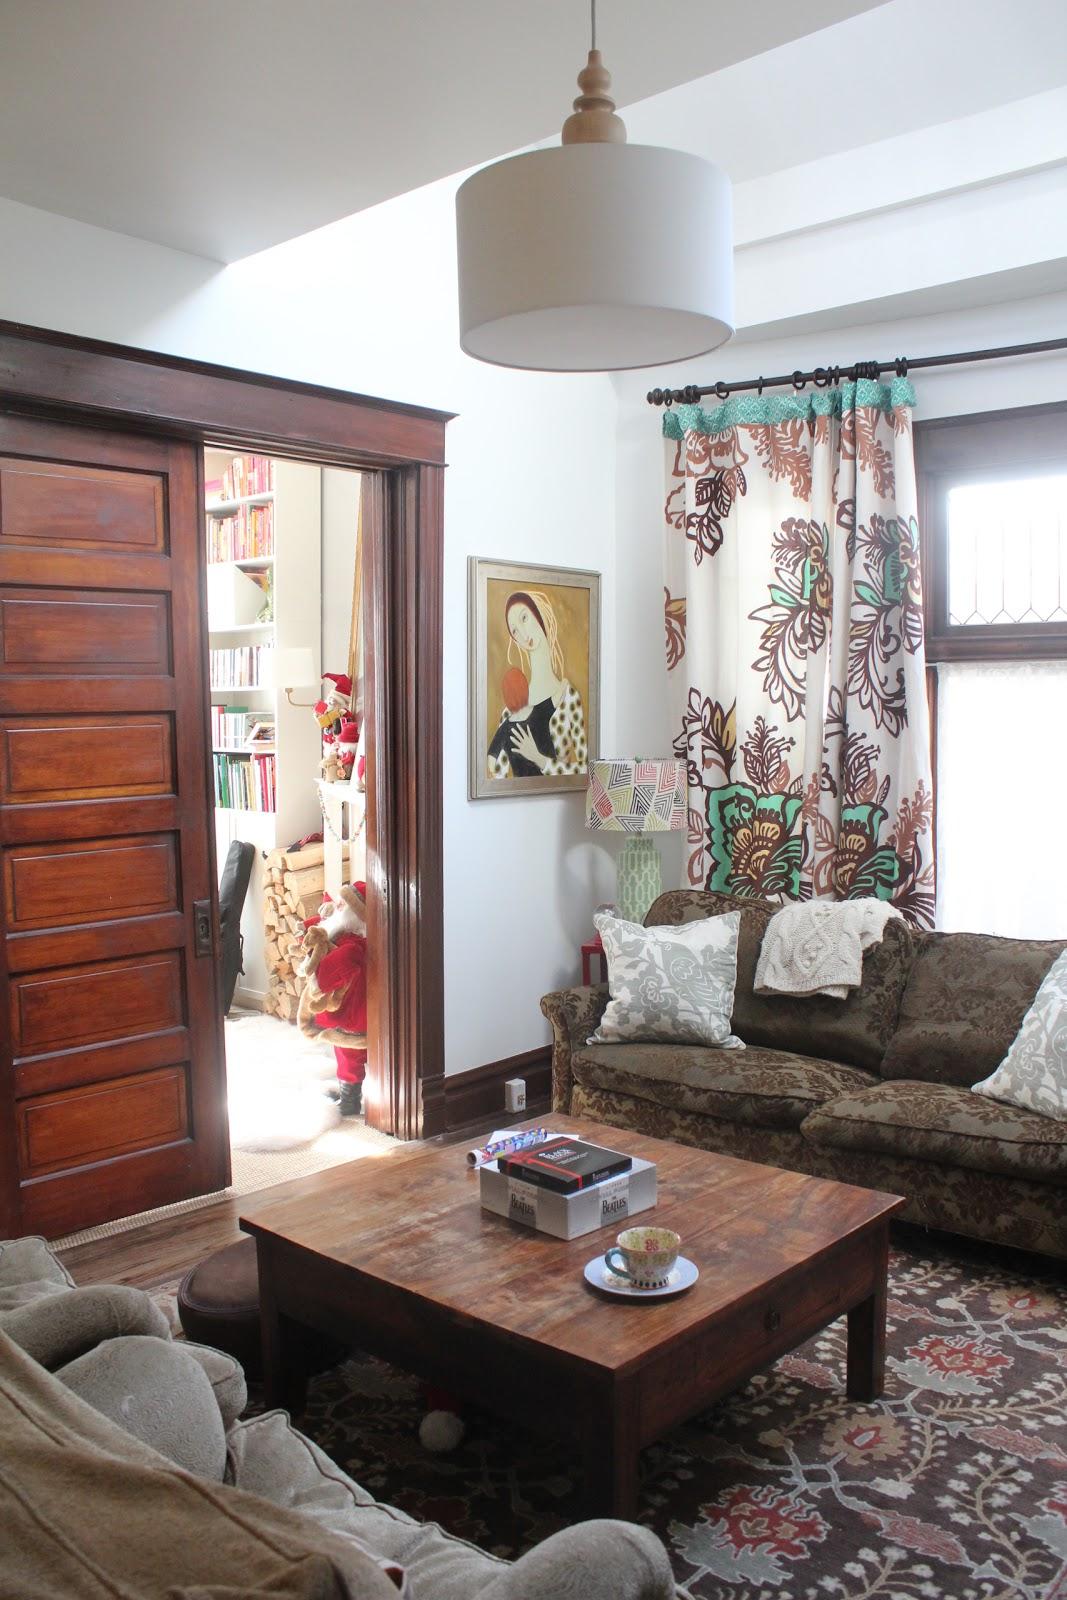 Brandon Persian Style Rug Pottery Barn Back On Festive Road Beni In The Living Room